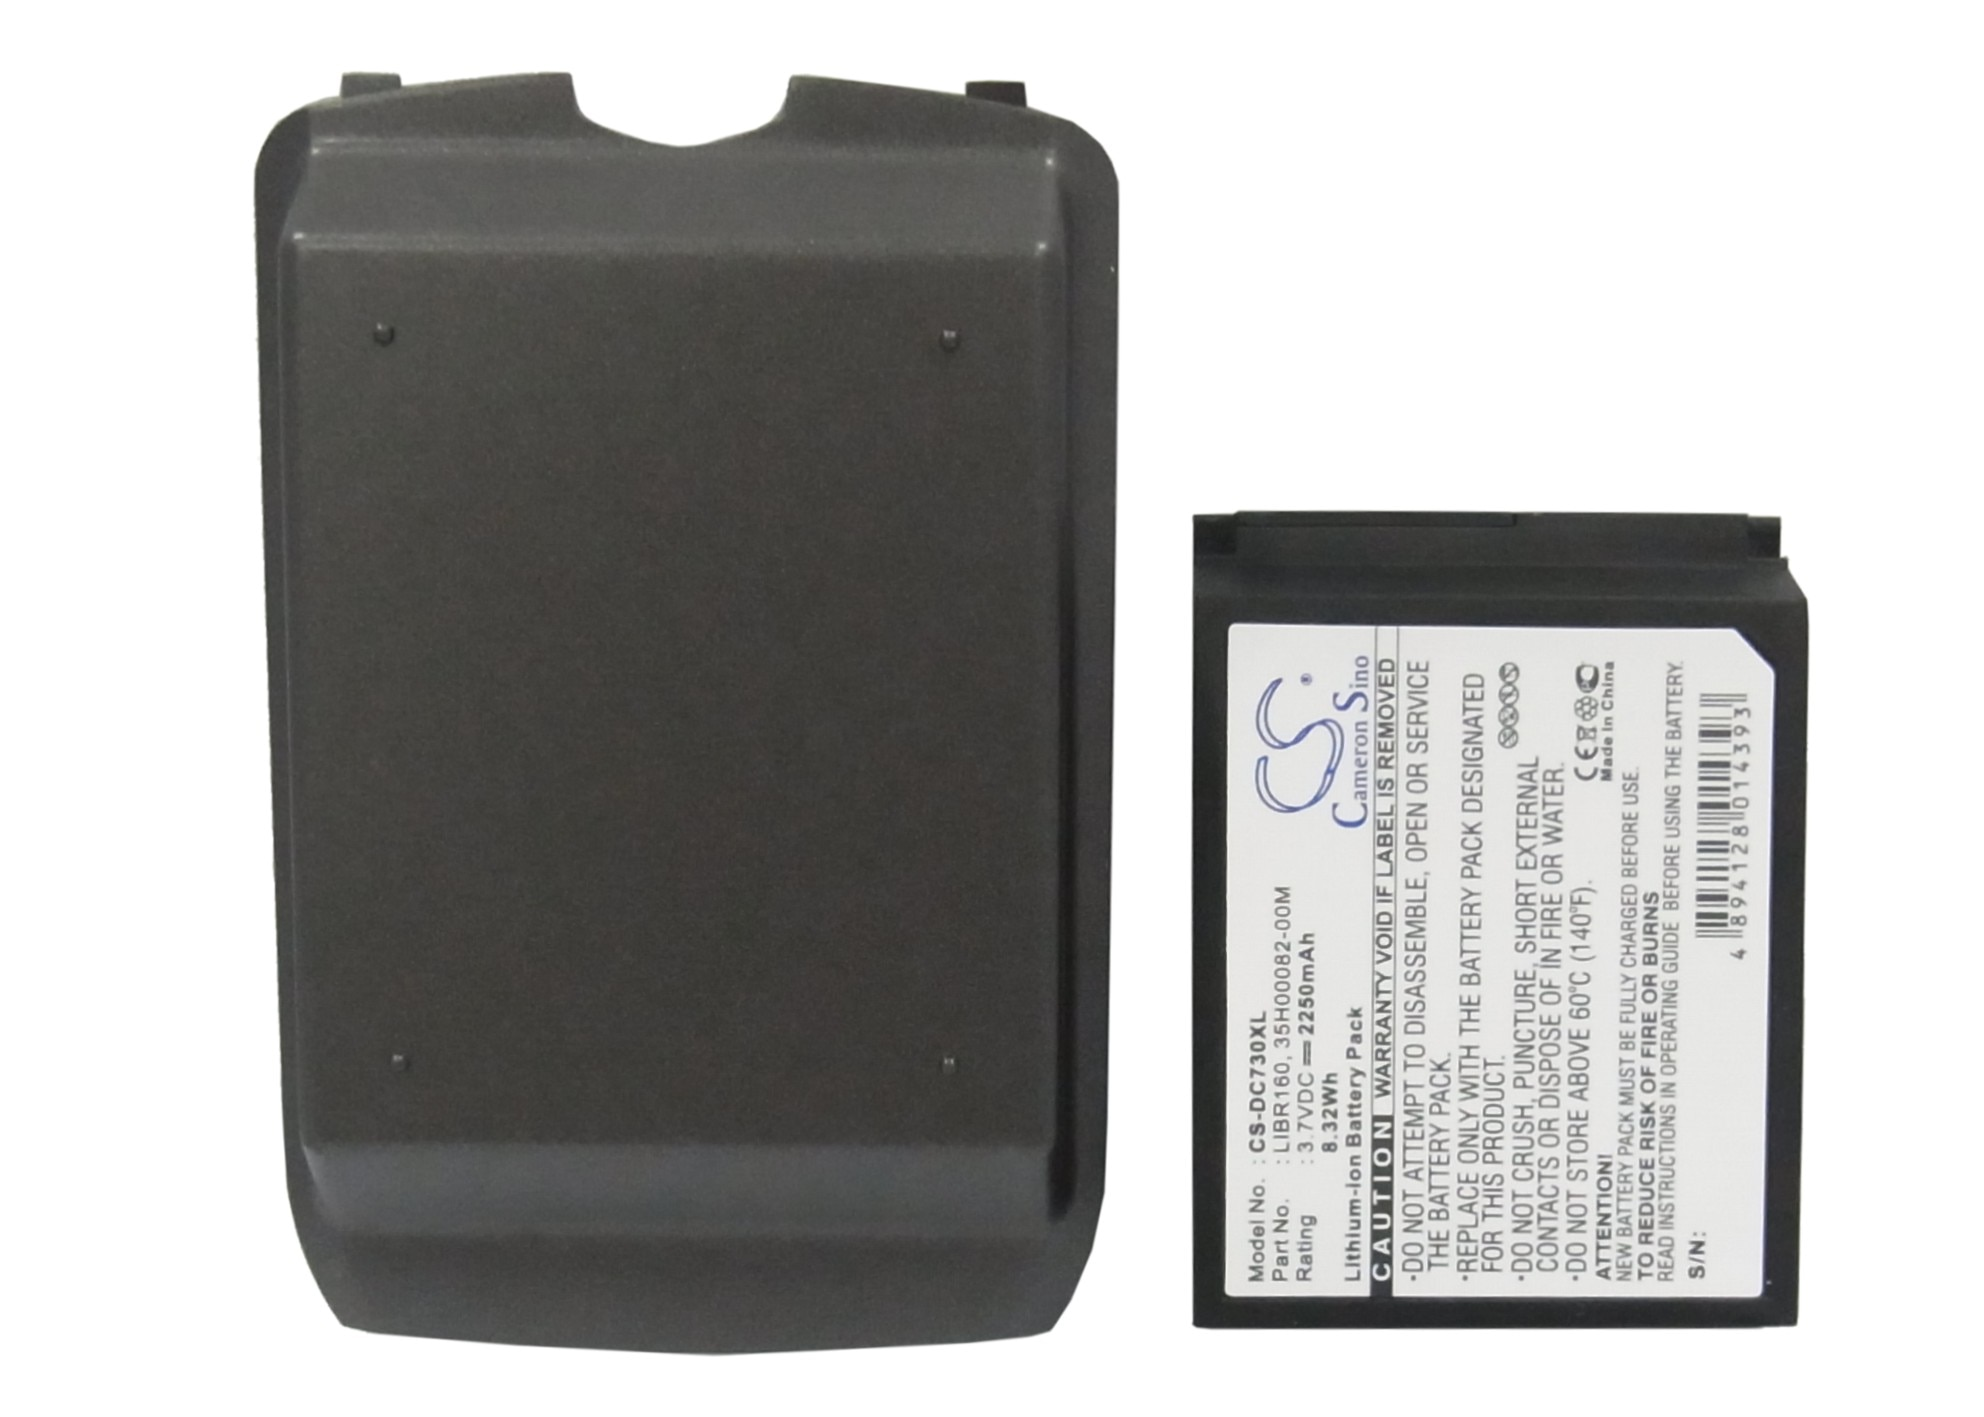 Batería de 2250mAh para HTC/DOPOD S630, C730, C730W, para SoftBank X02HT